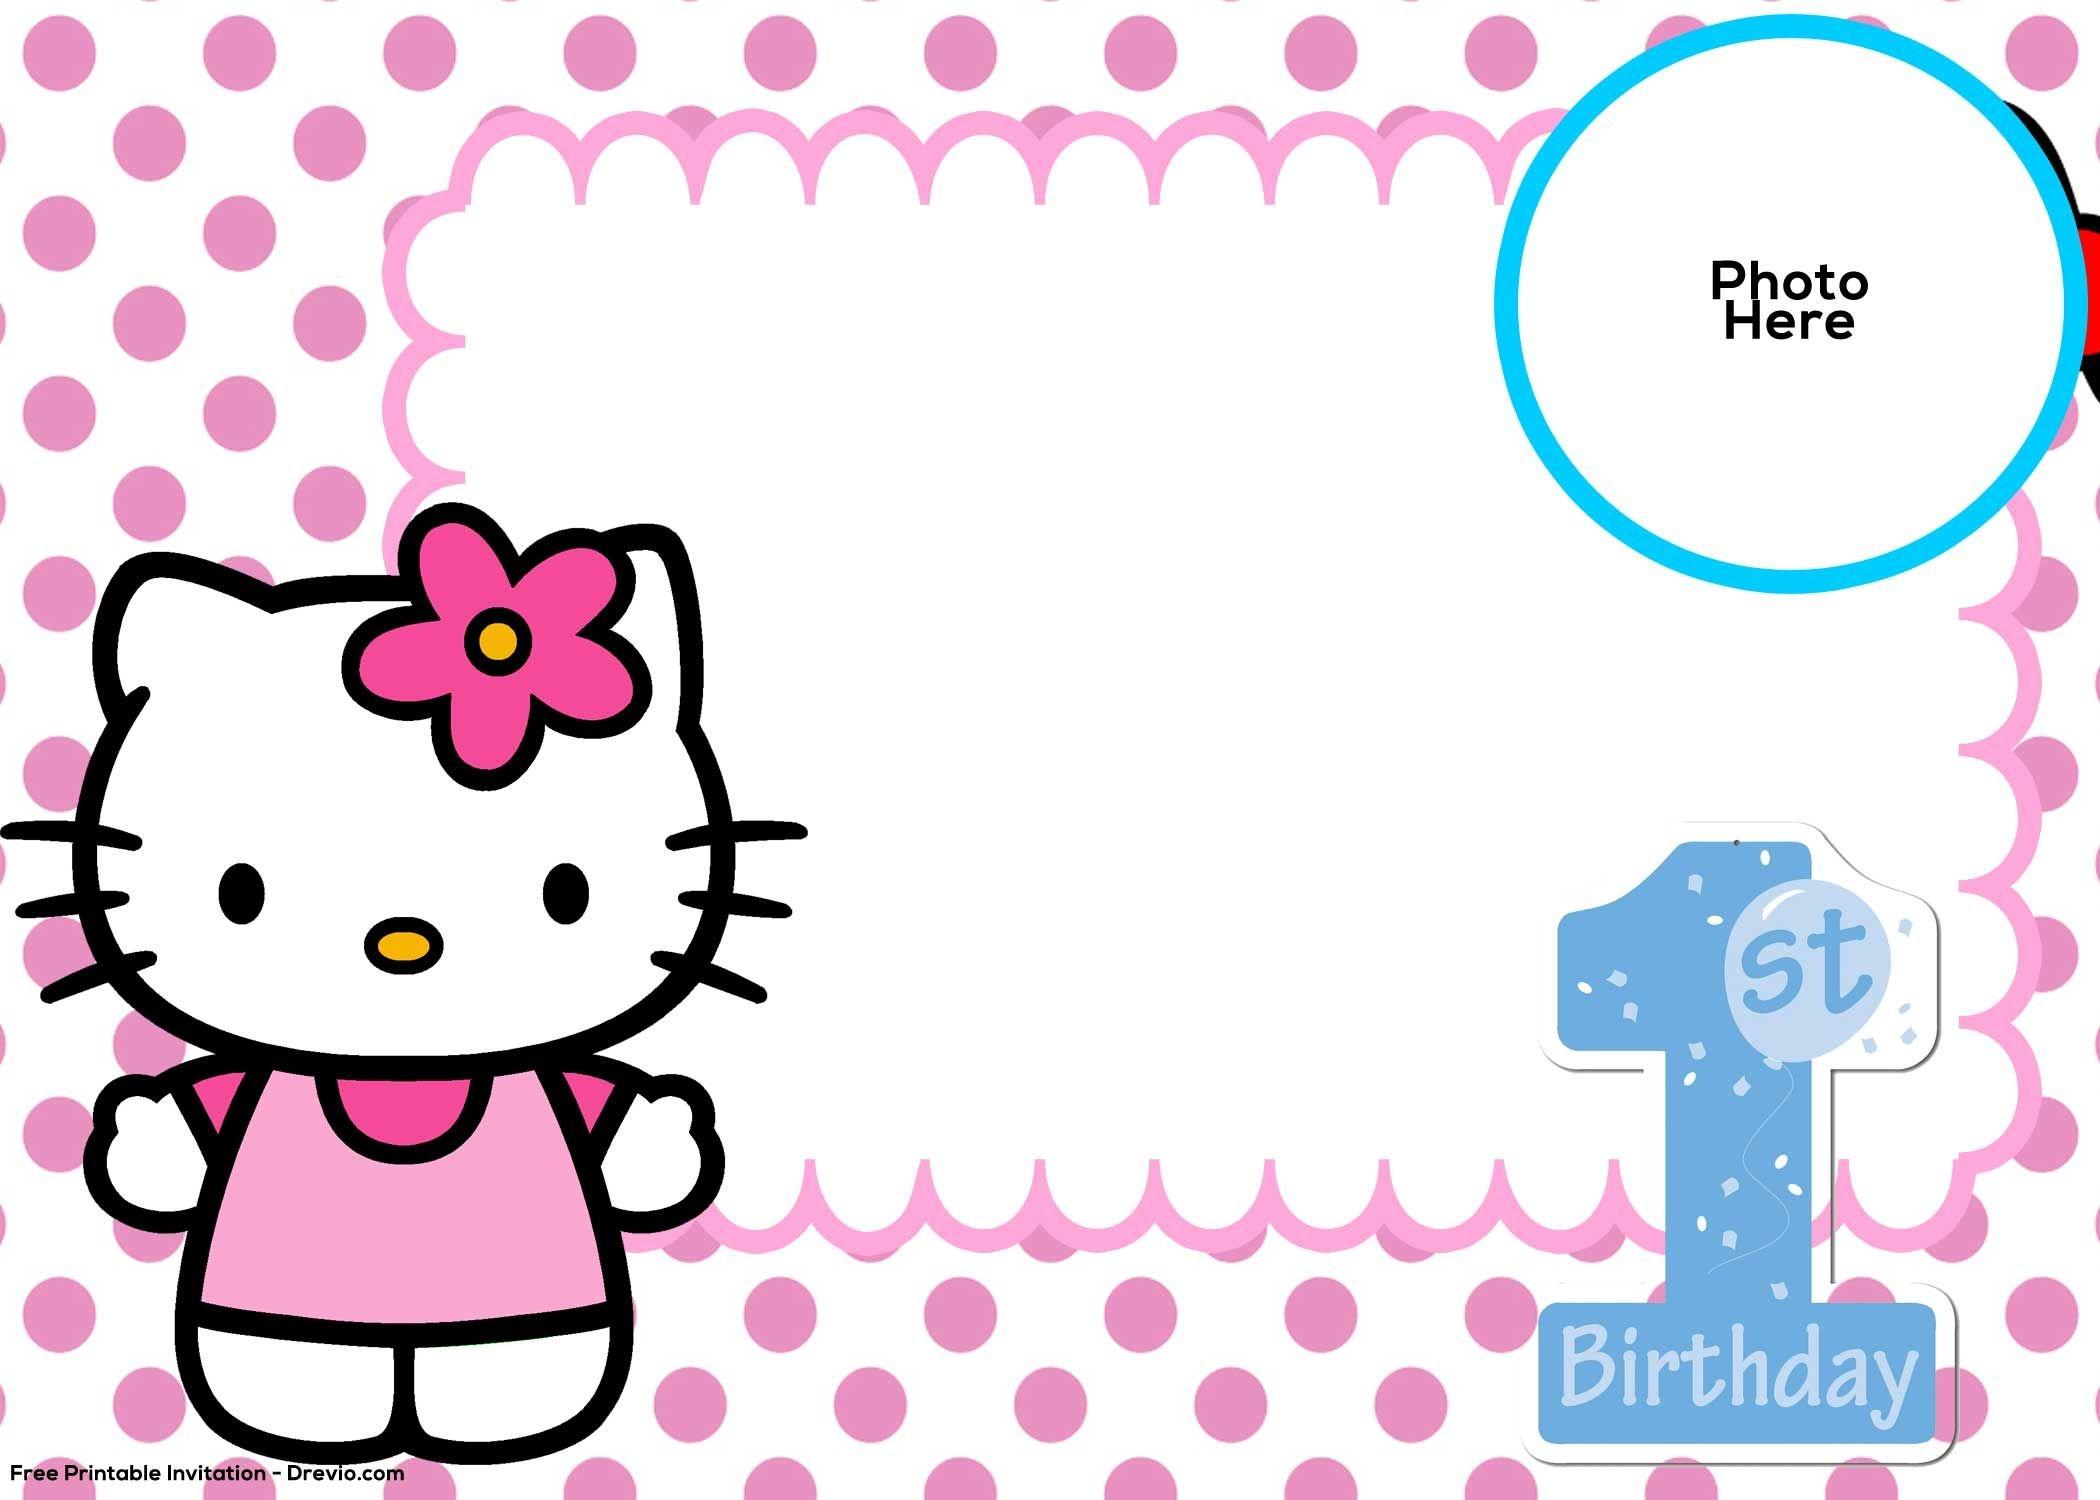 Hello Kitty Birthday Invitation Template - Kaza.psstech.co - Hello Kitty Free Printable Invitations For Birthday